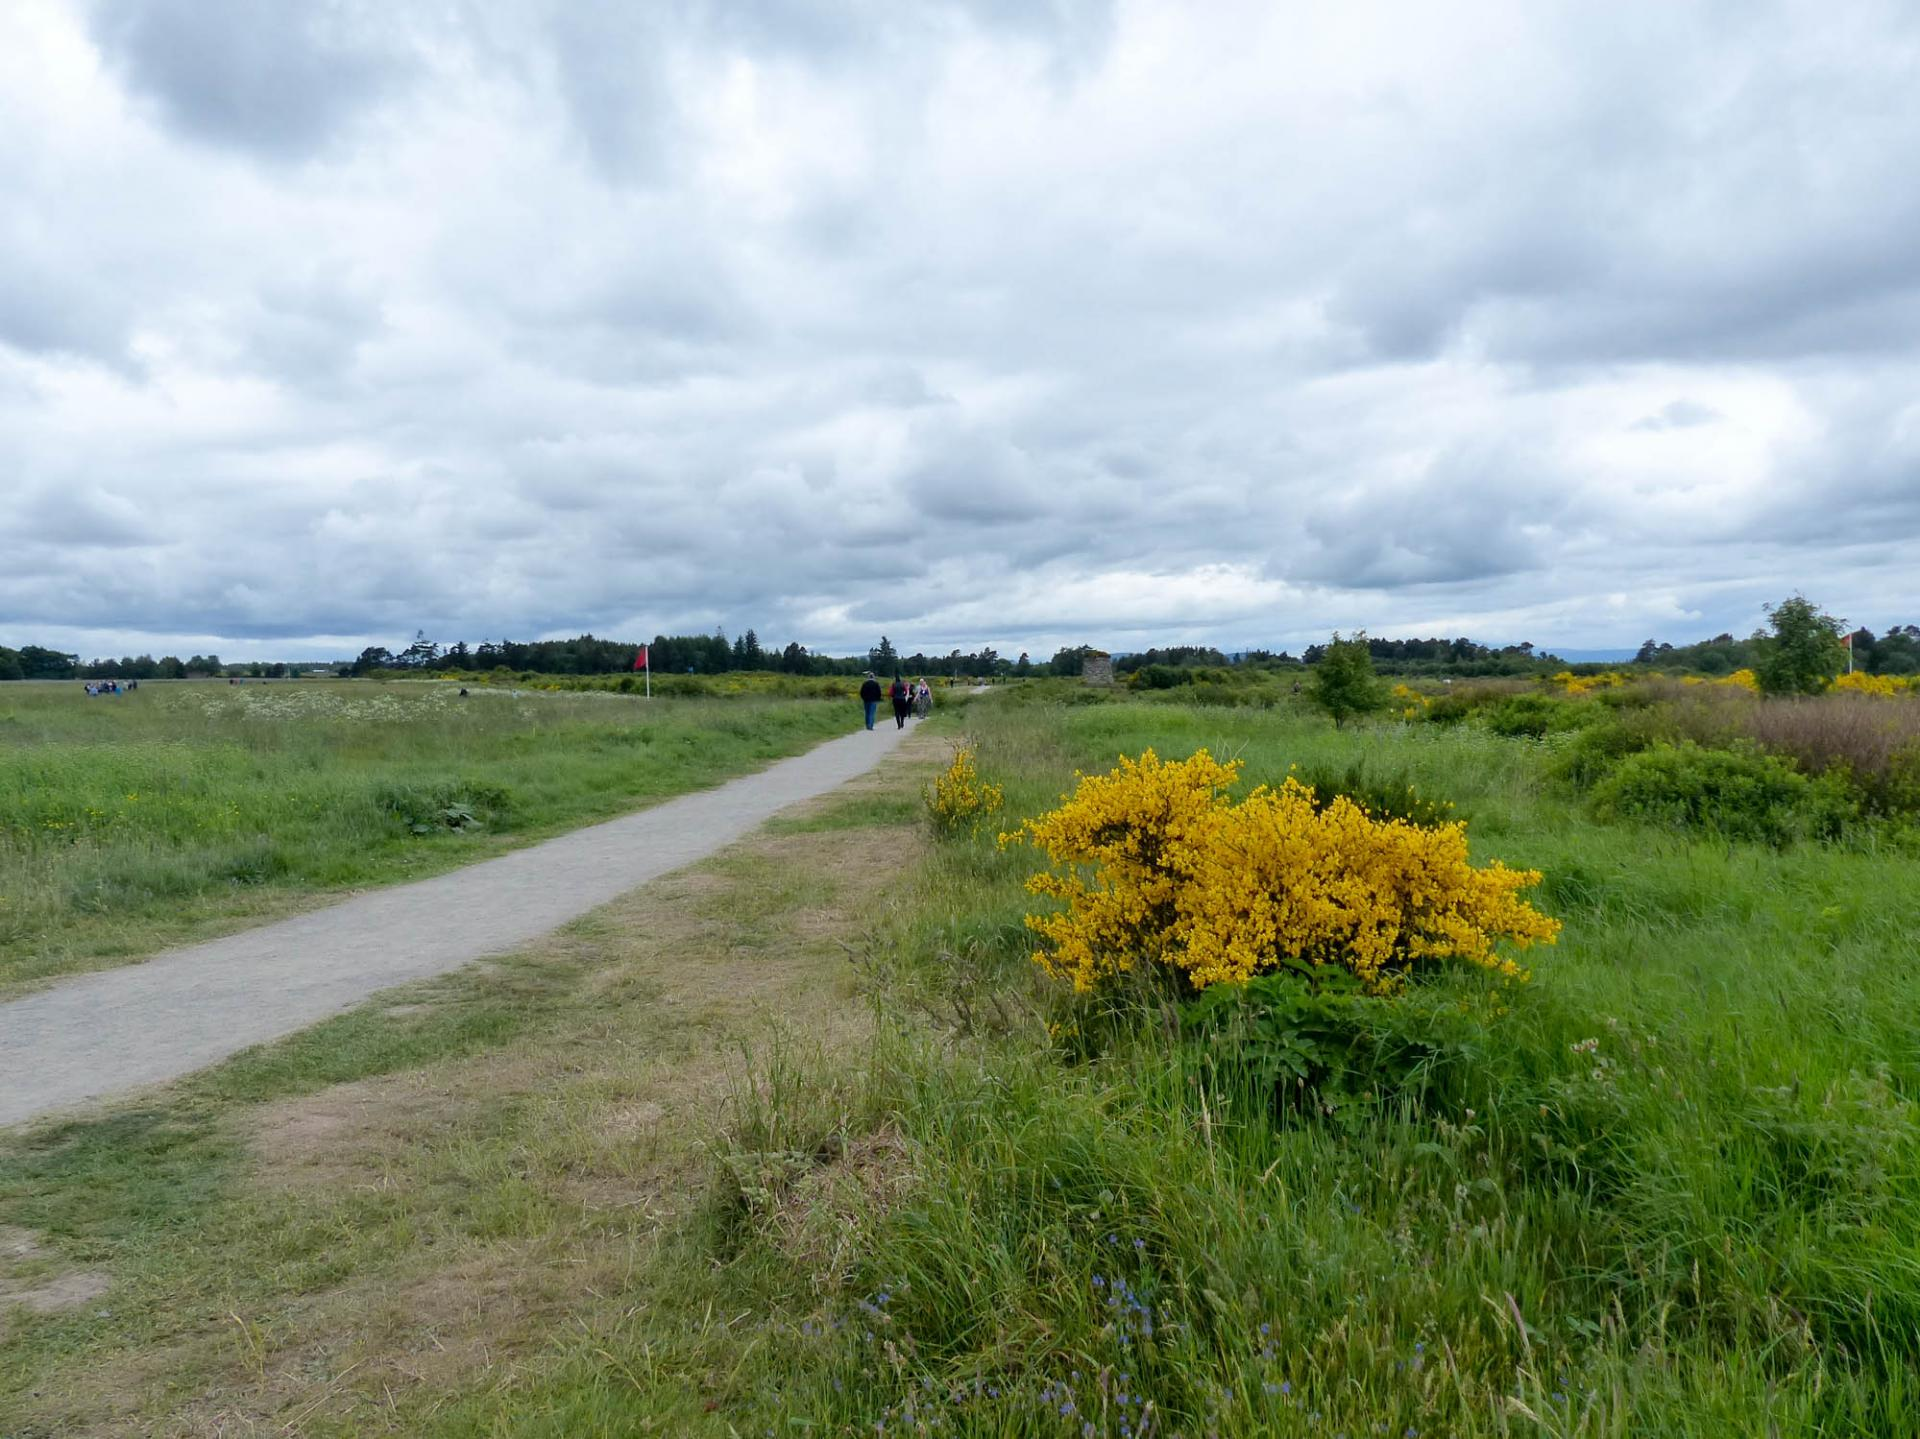 16 Champ de bataille de Culloden